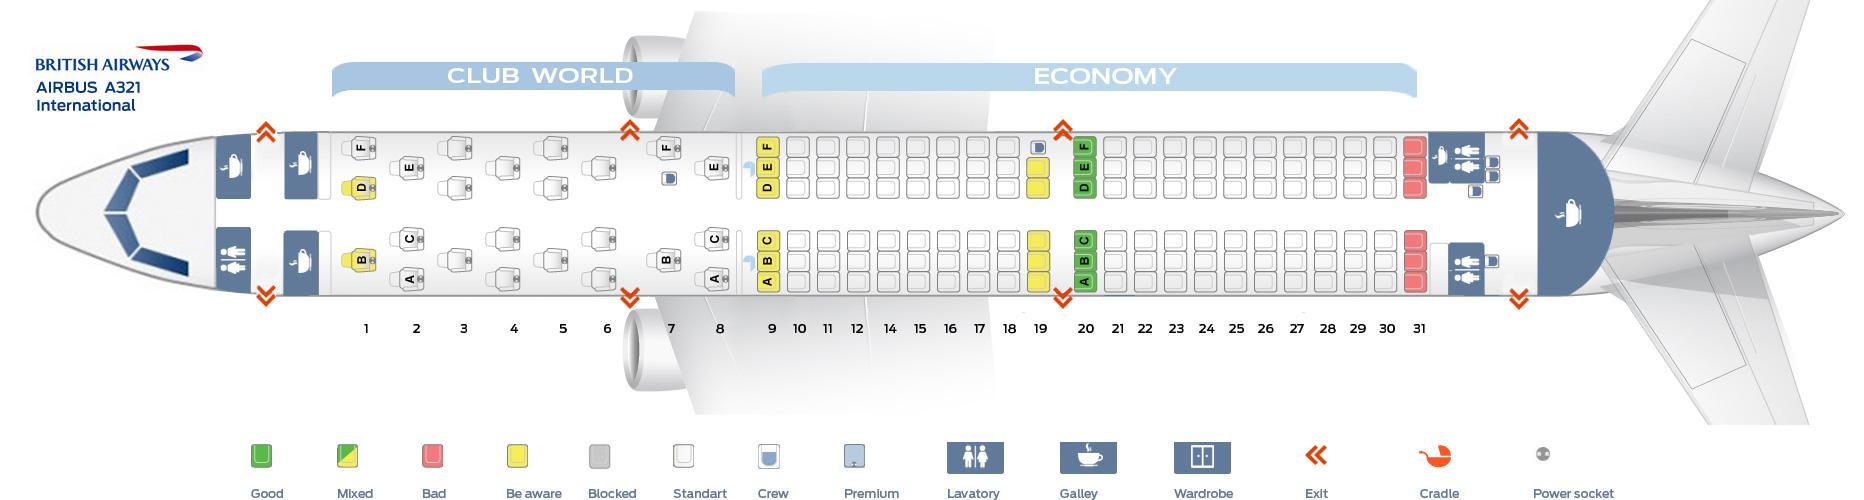 Seat_map_British_Airways_Airbus_A321_International